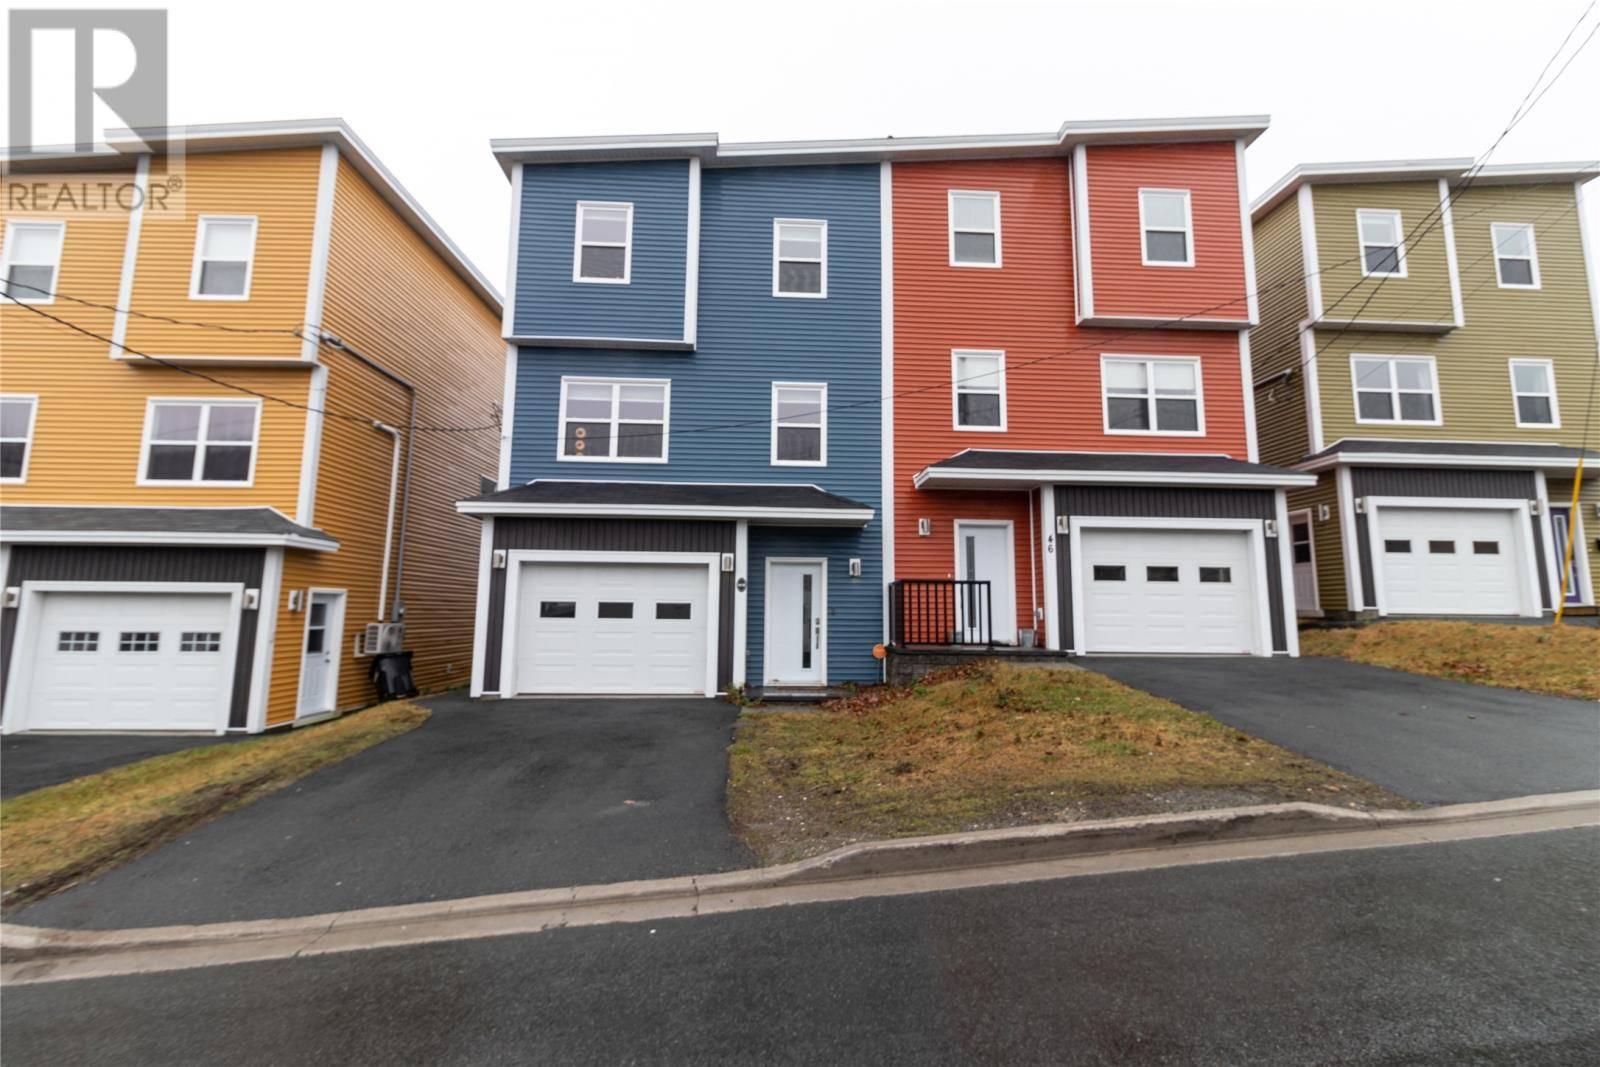 House for sale at 46 Quidi Vidi Village Rd St. John's Newfoundland - MLS: 1208794